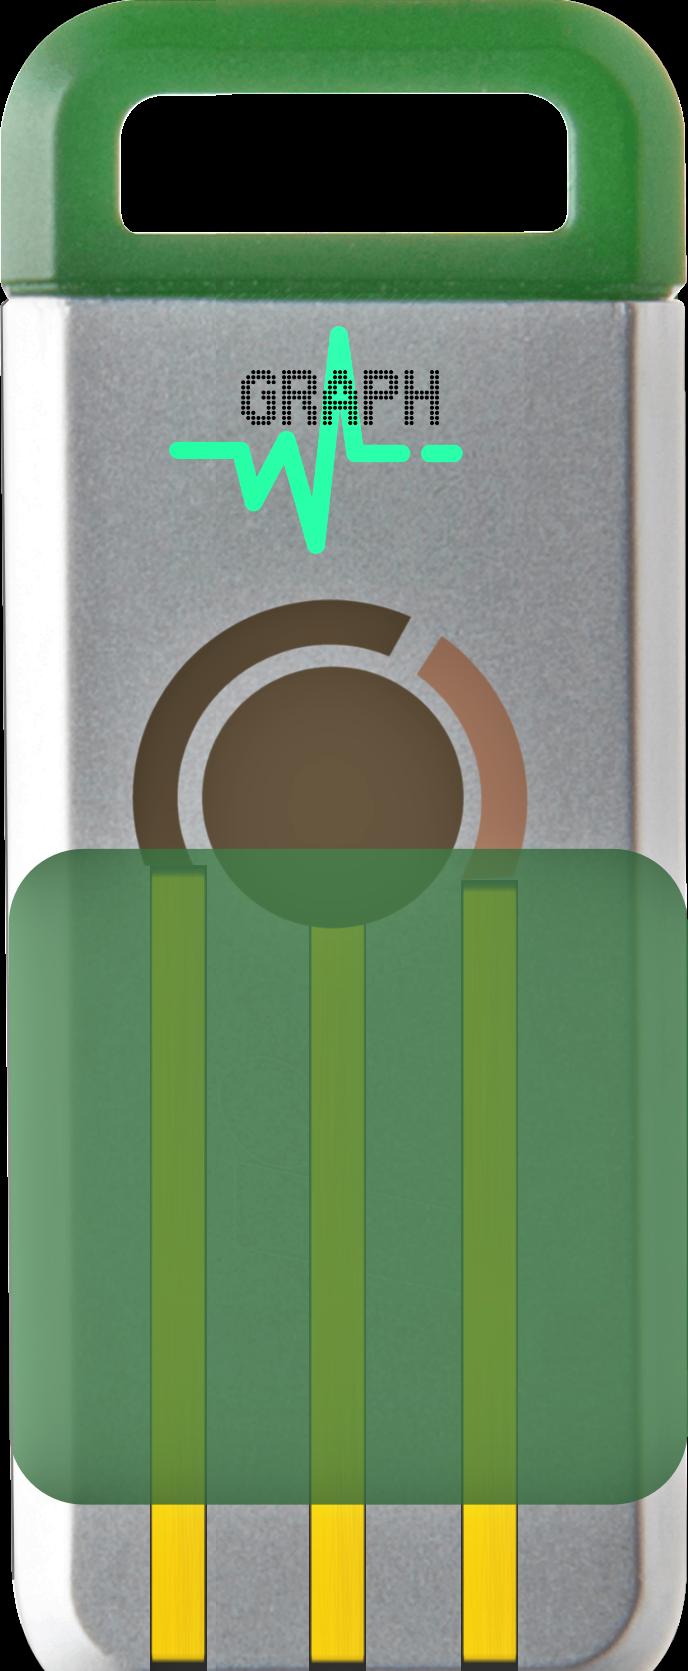 cietec - Biosensor